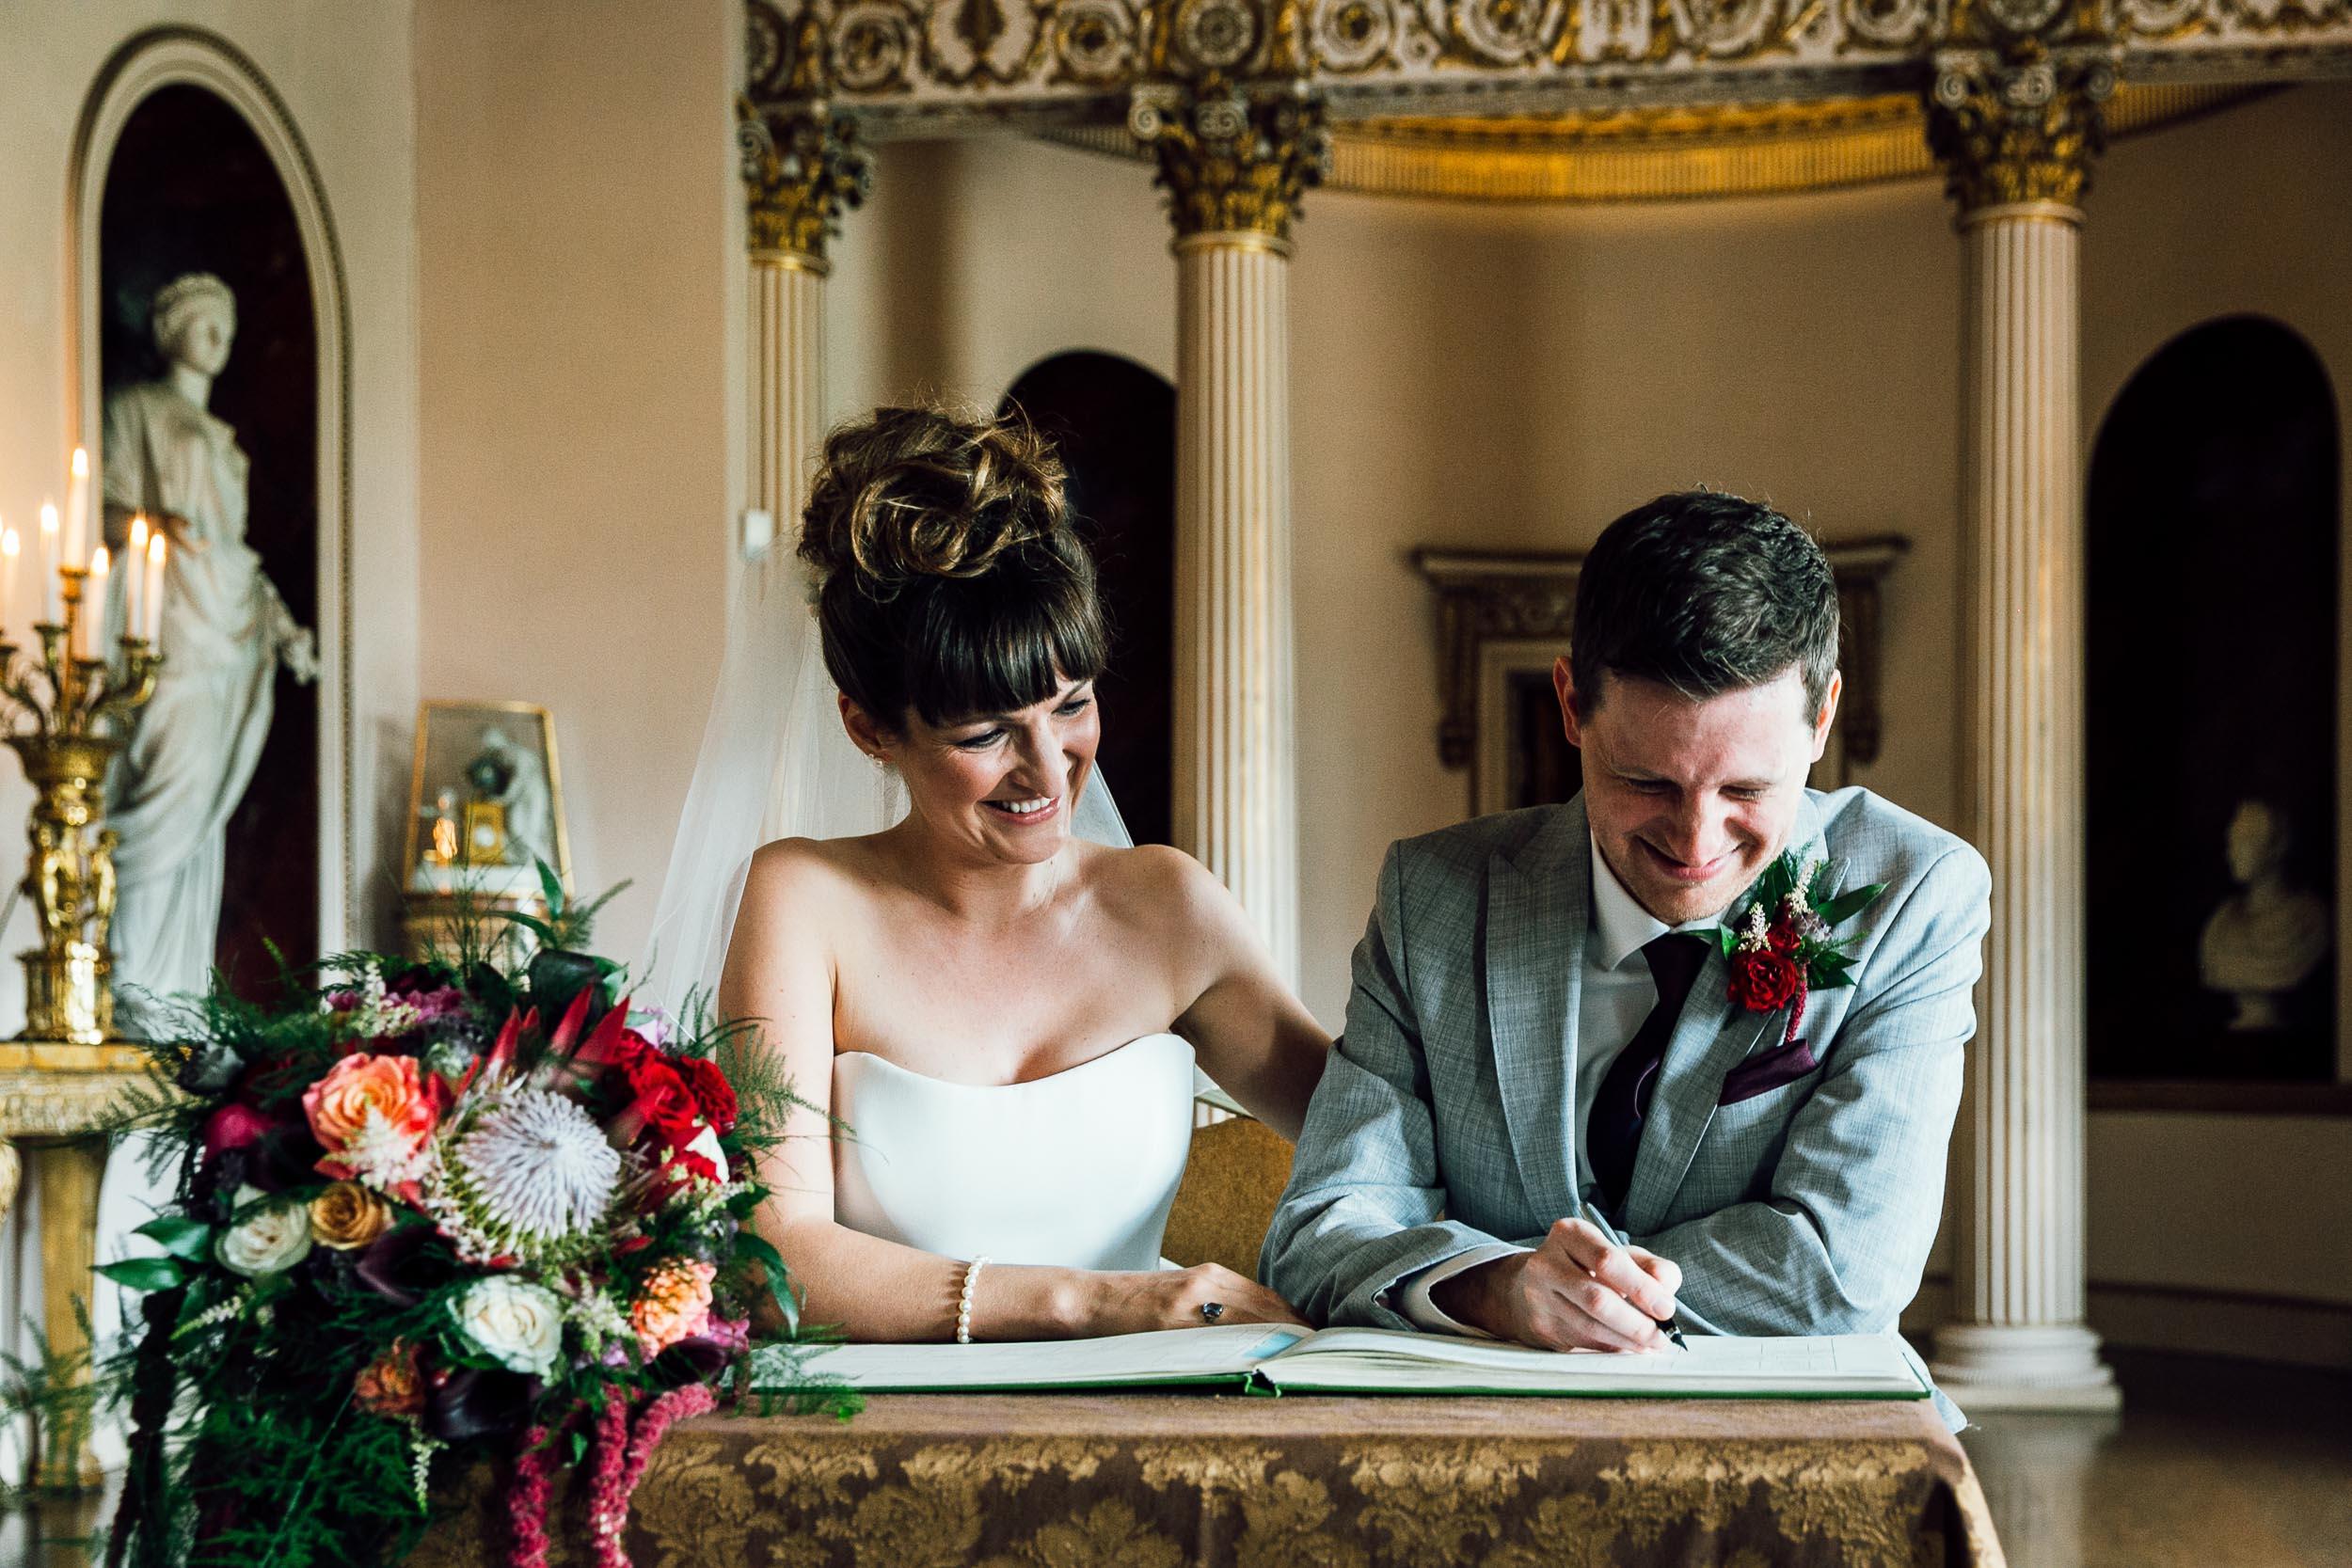 syon-house-wedding-photographer-london 067.jpg